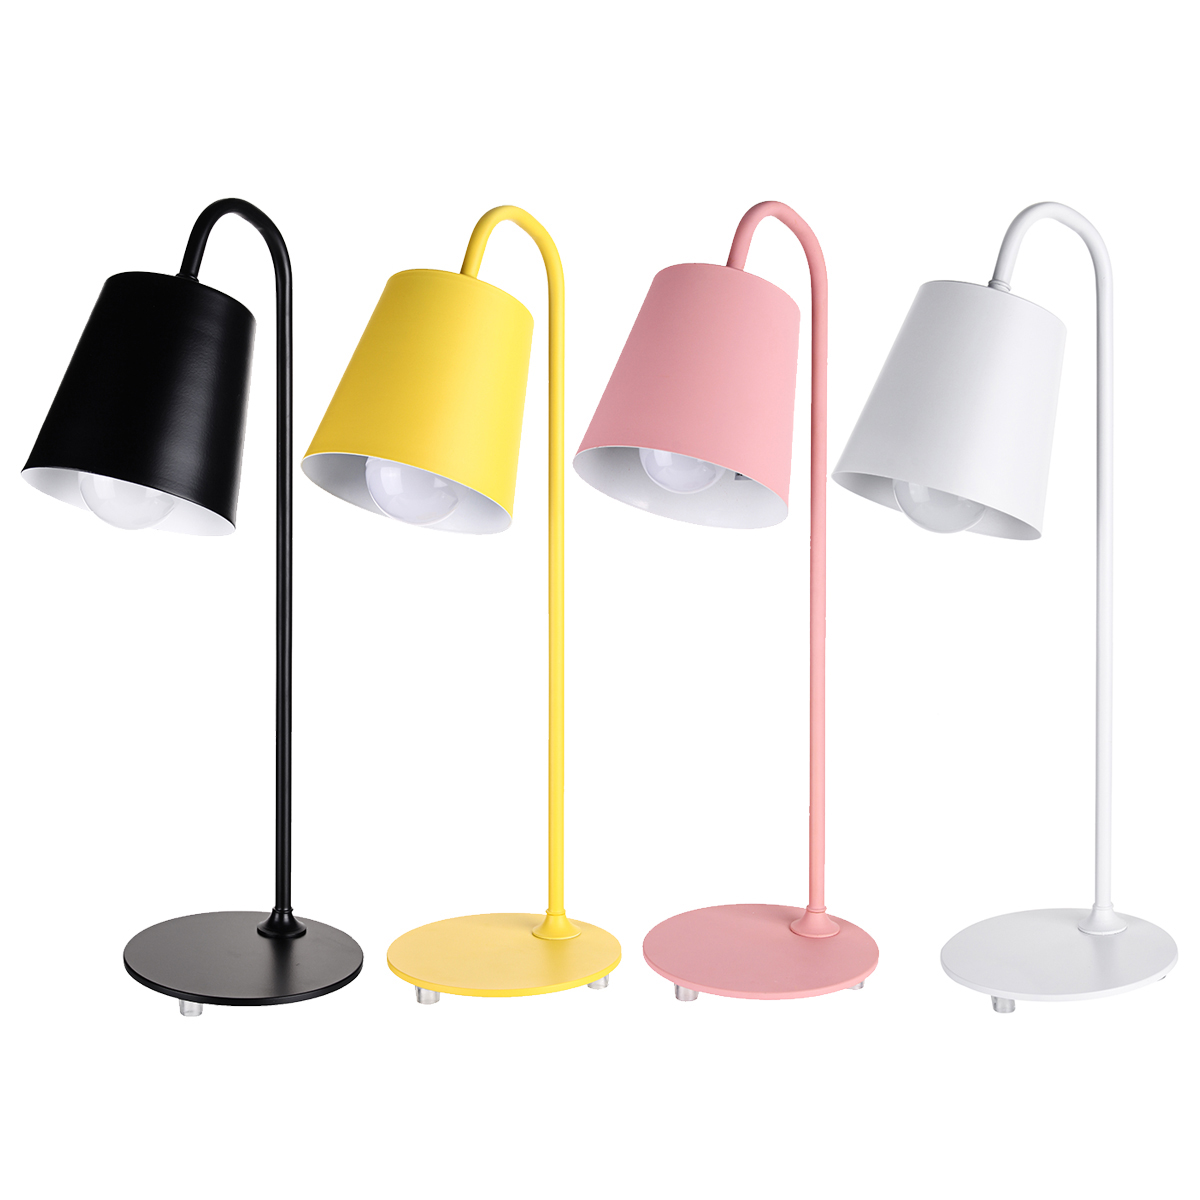 Nordic Metal Table Lamp Bedside Desk Lamp Kids Bedroom